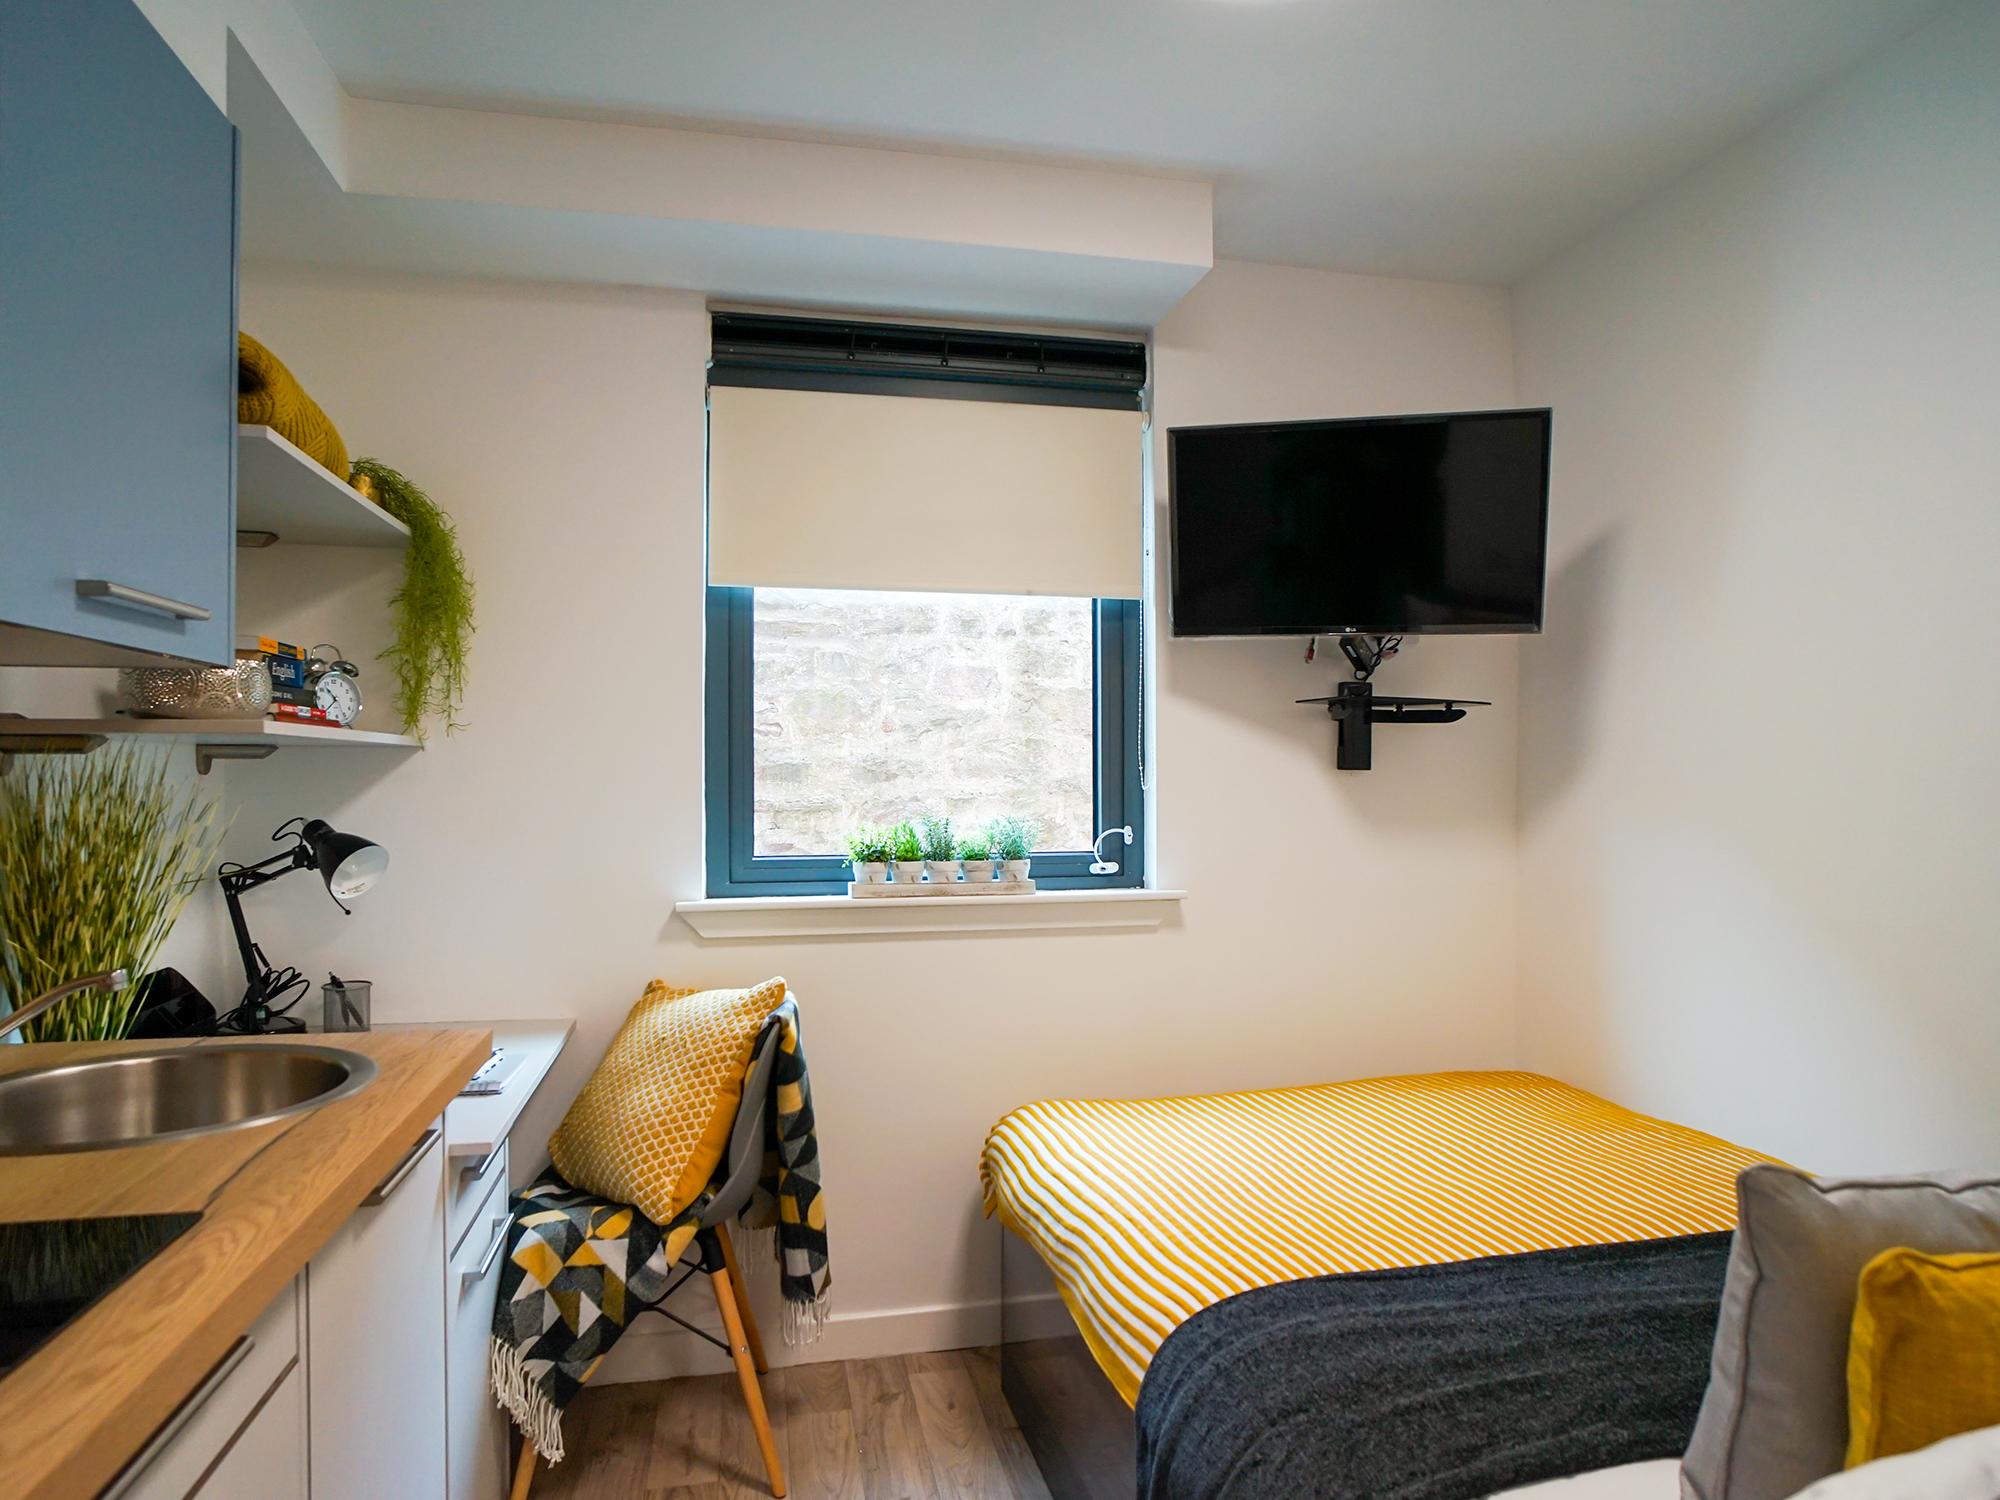 student-accommodation-edinburgh-goods-corner-standard-studio (3)